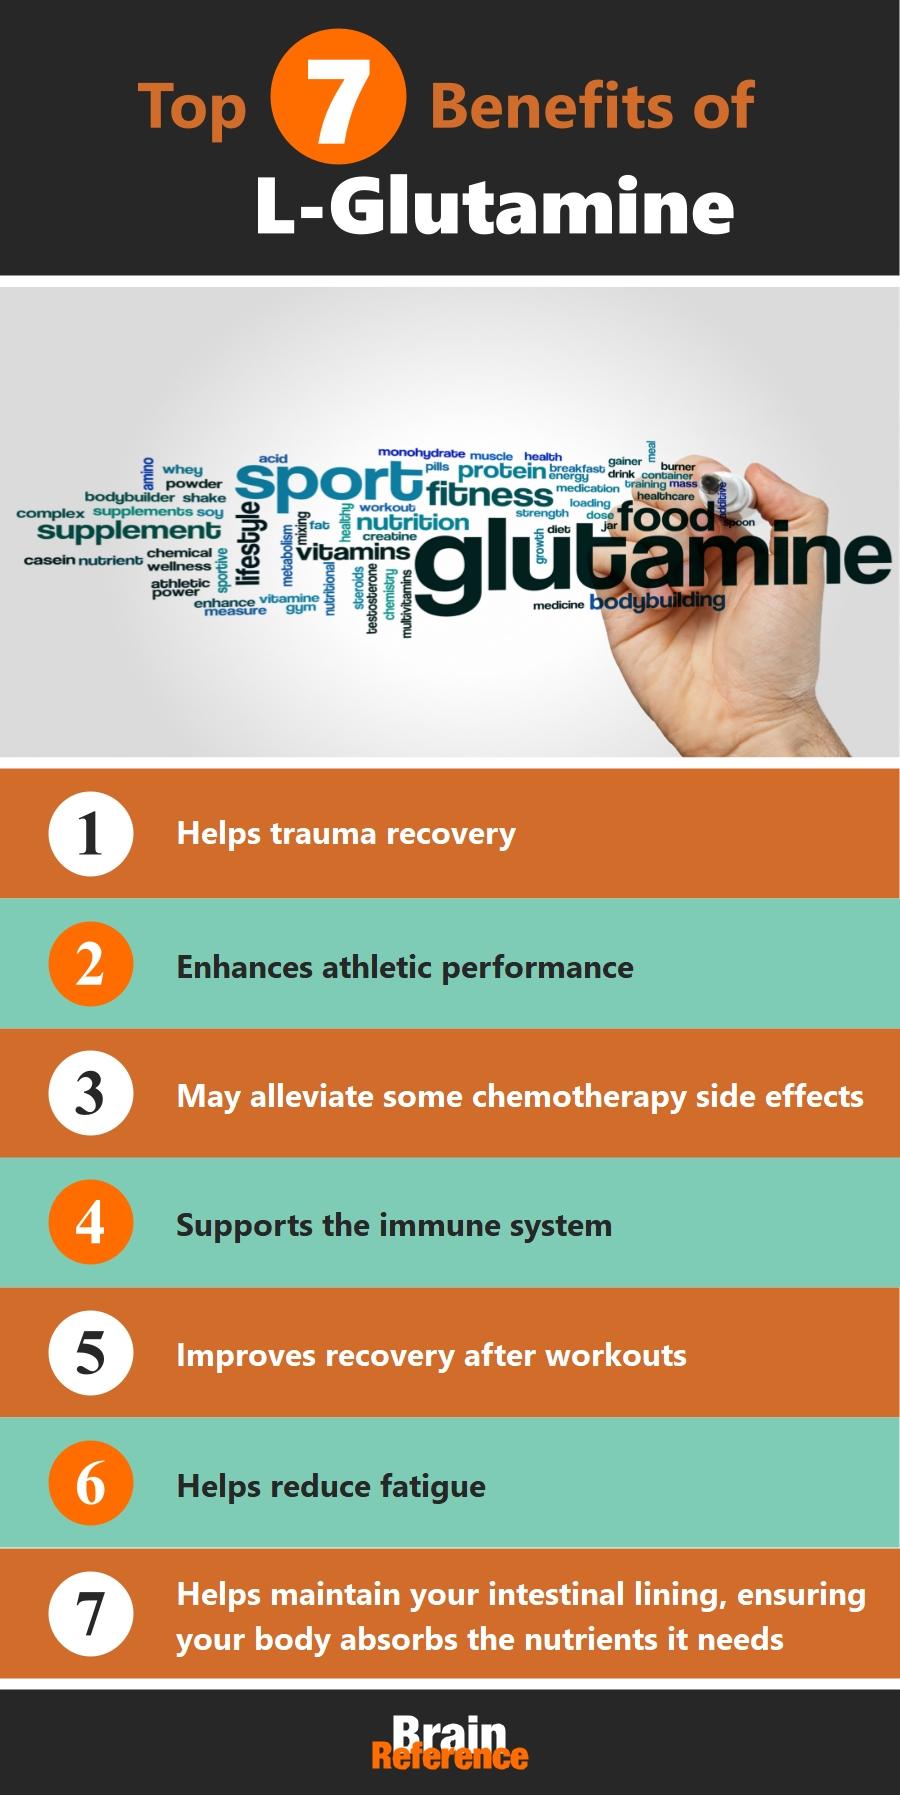 Brain-Plus-Arazo-Nutrition-L-Glutamine-Benefits